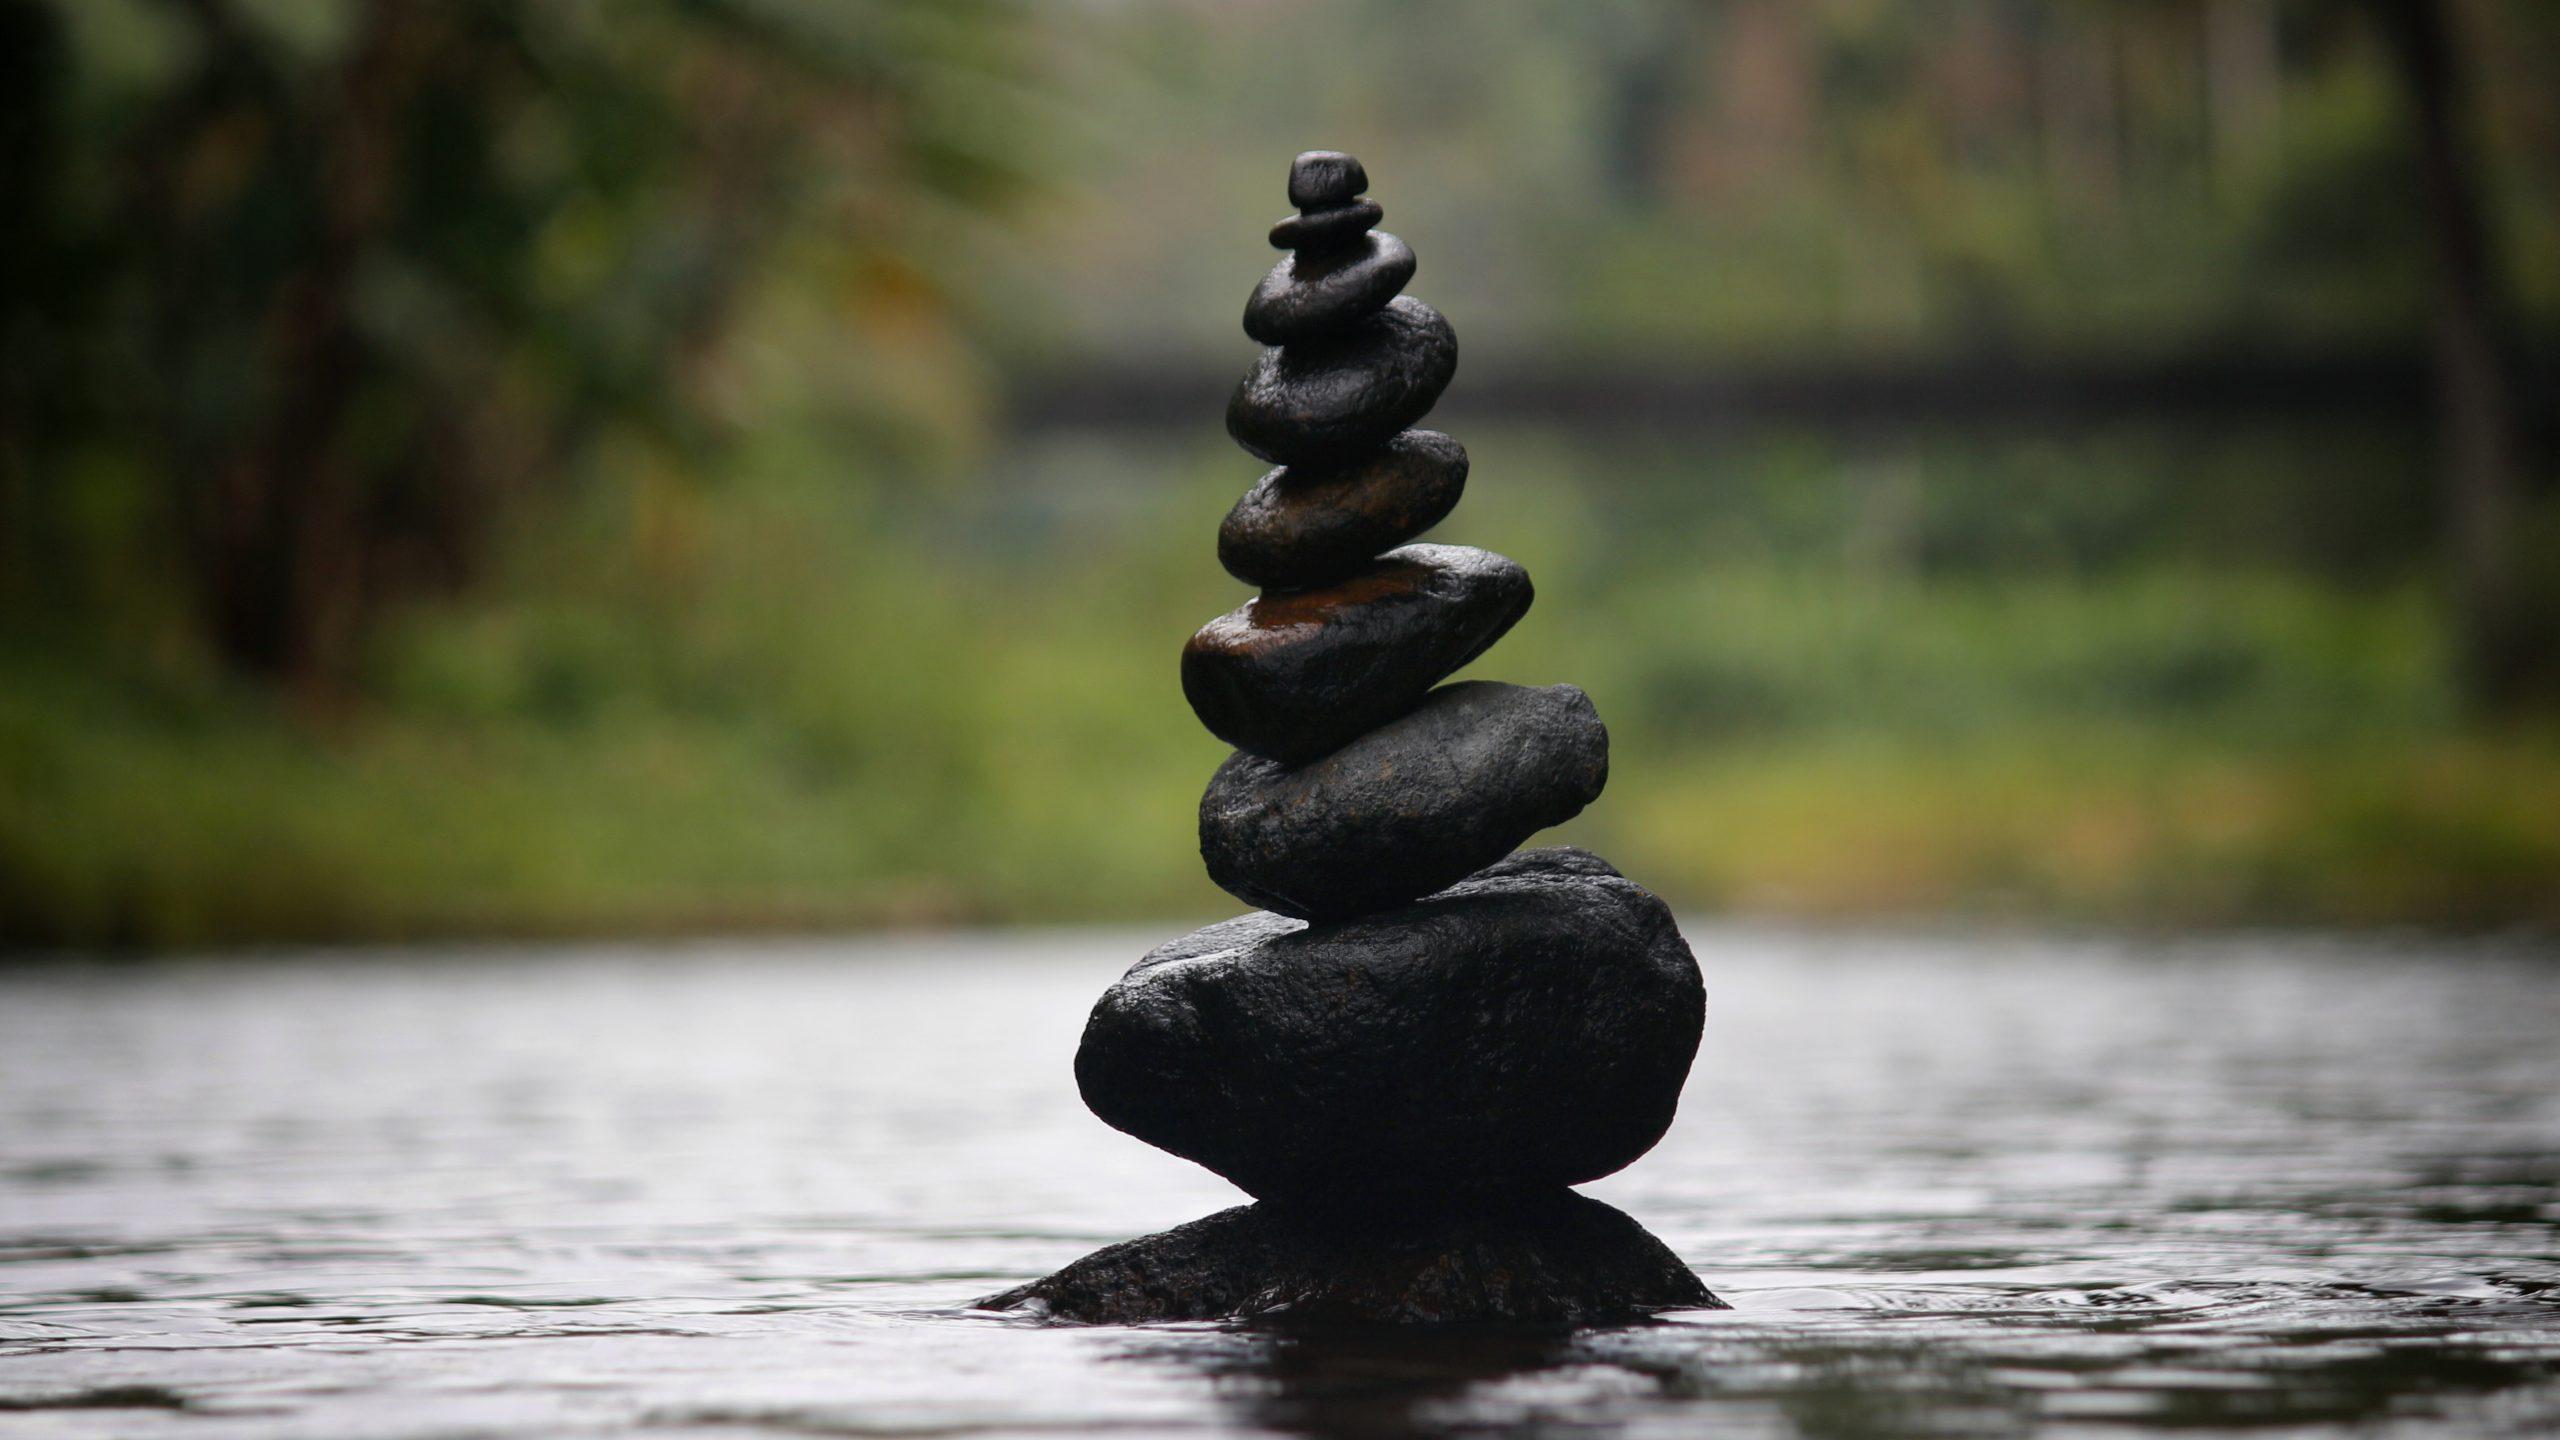 Black Stones Balance 4k 5k Wallpaper Hd Wallpaper Background